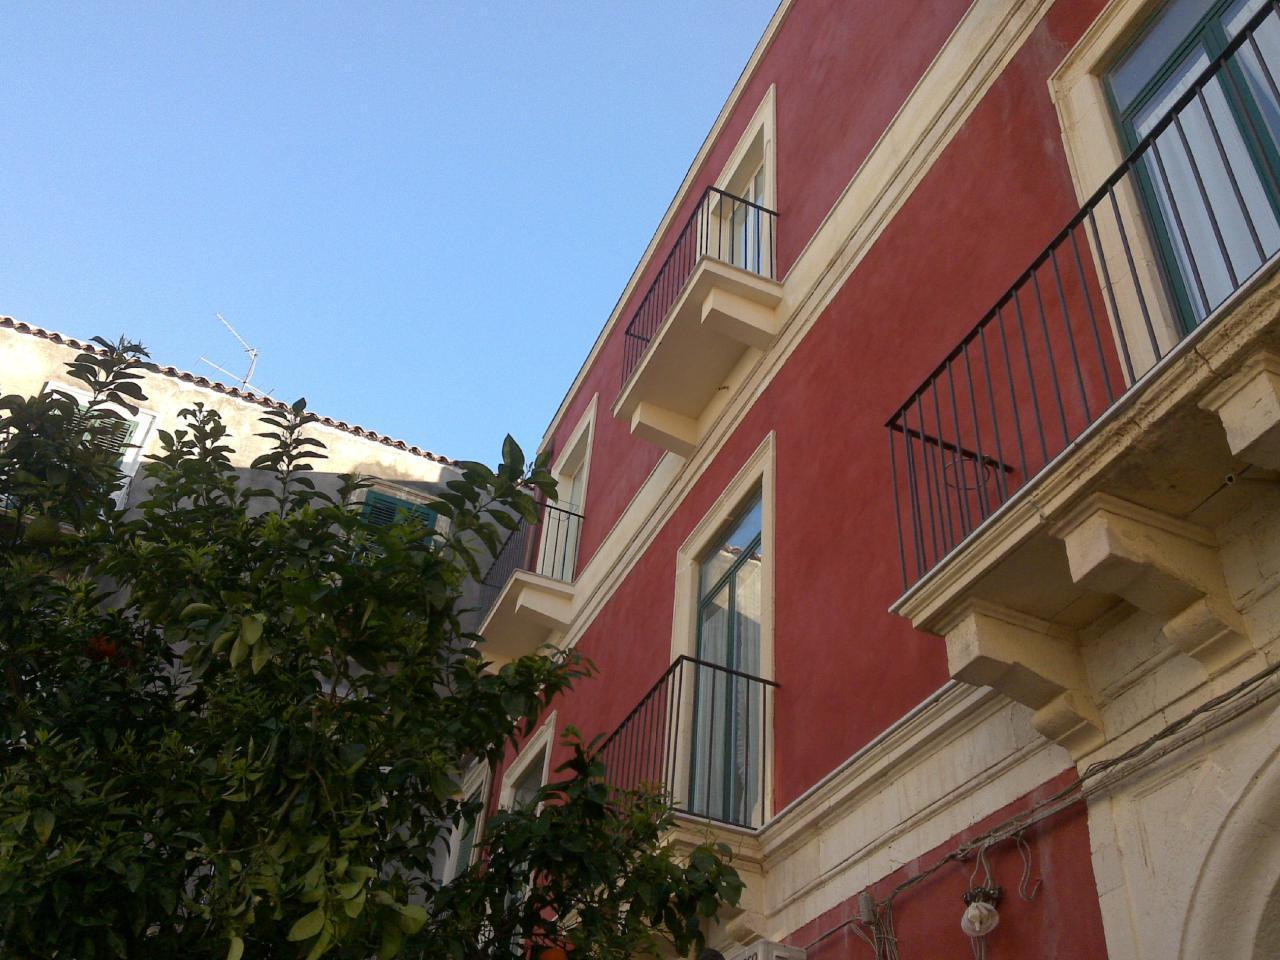 Appartement de vacances Besondere und einzigartige Penthouse mit Blick (1939978), Catania, Catania, Sicile, Italie, image 22